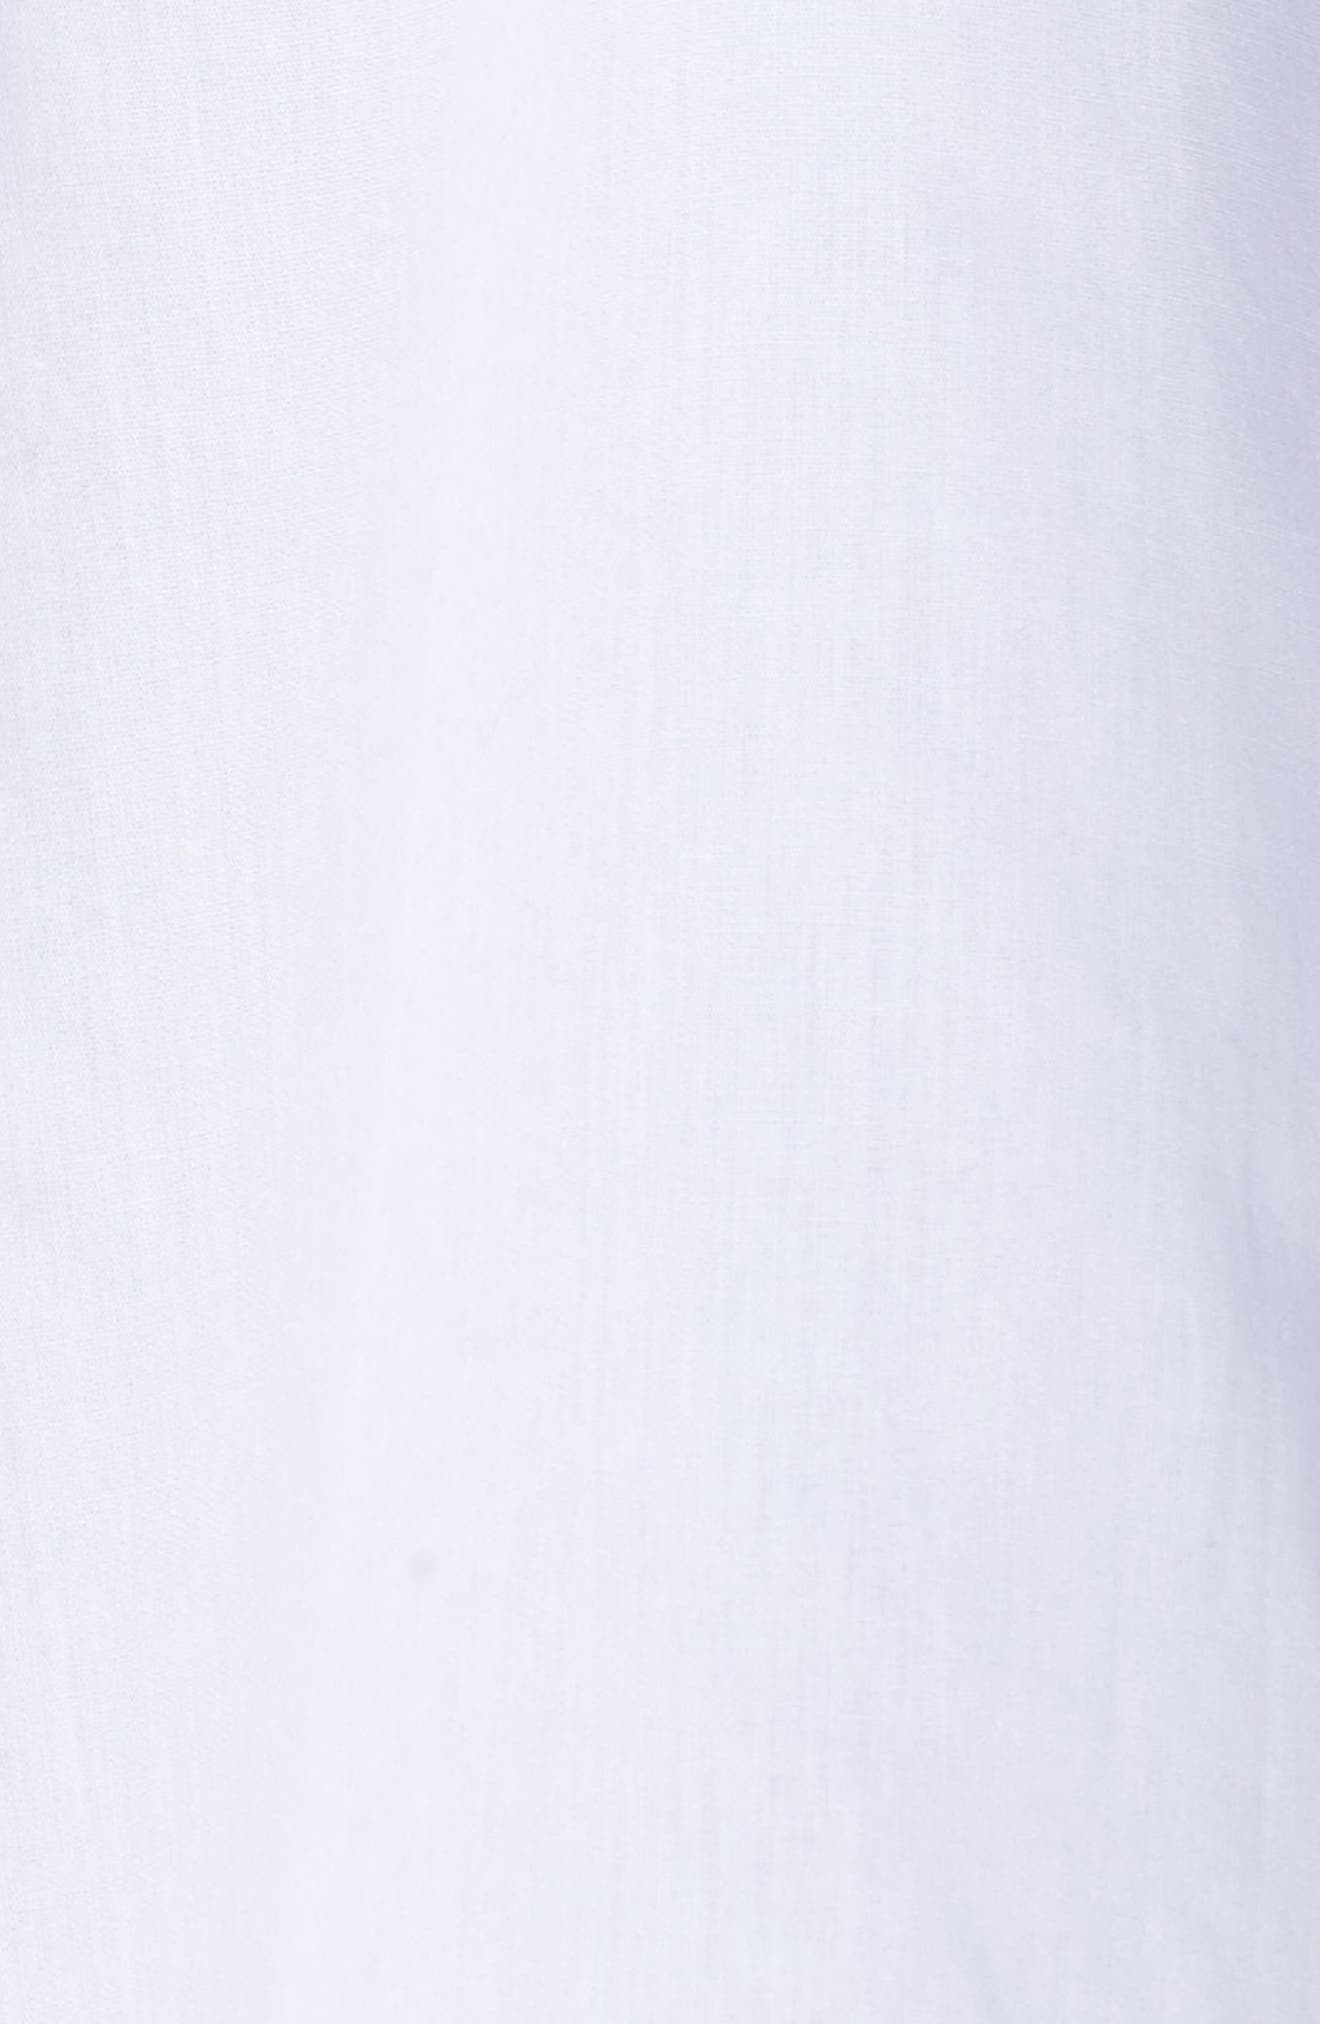 Fato Shirt,                             Alternate thumbnail 5, color,                             White